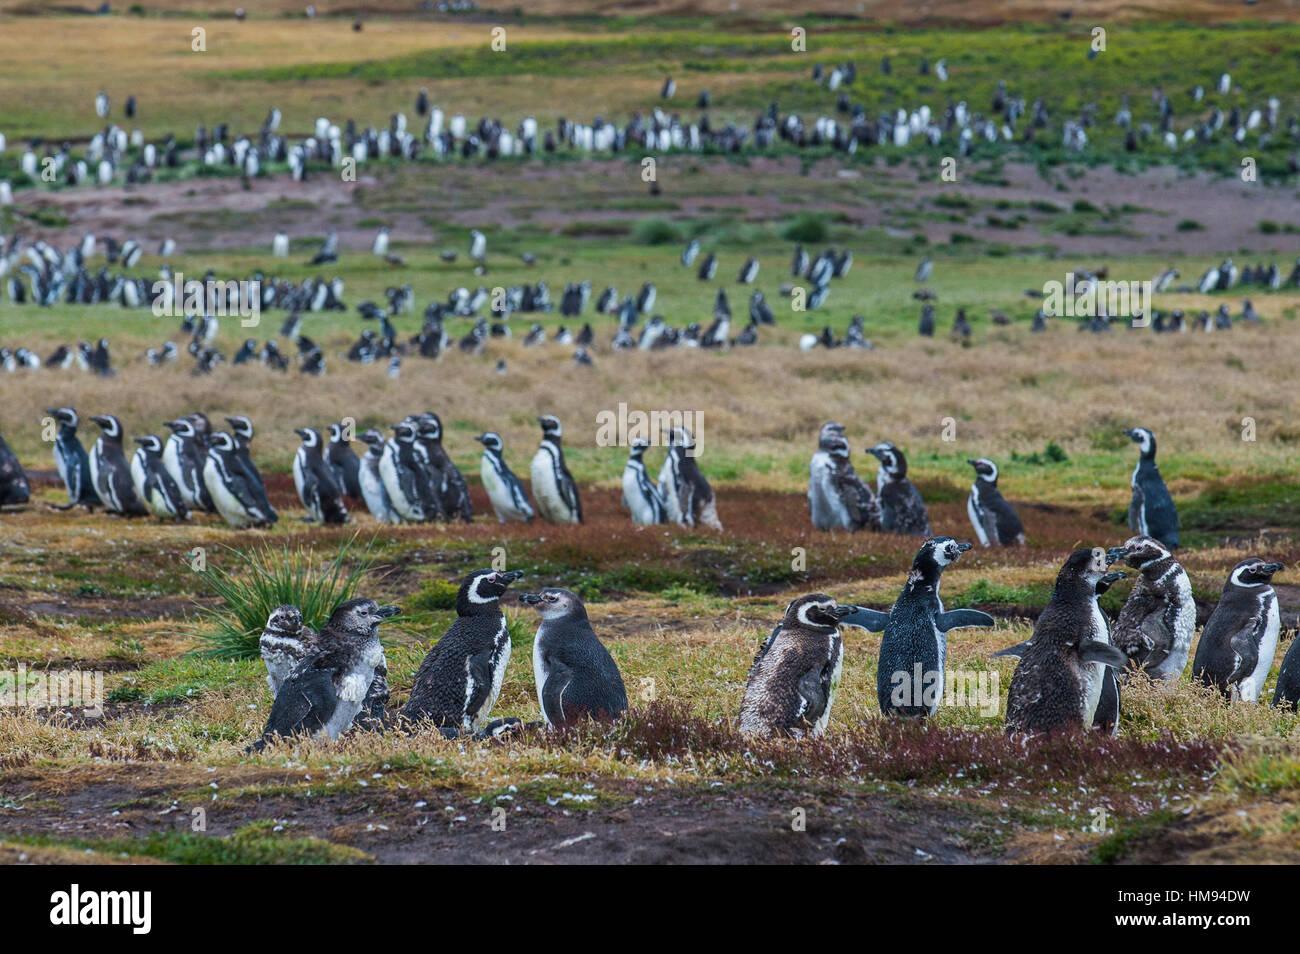 Magellanic penguin (Spheniscus magellanicus) colony, Carcass Island, West Falklands, Falkland Islands, South America - Stock Image